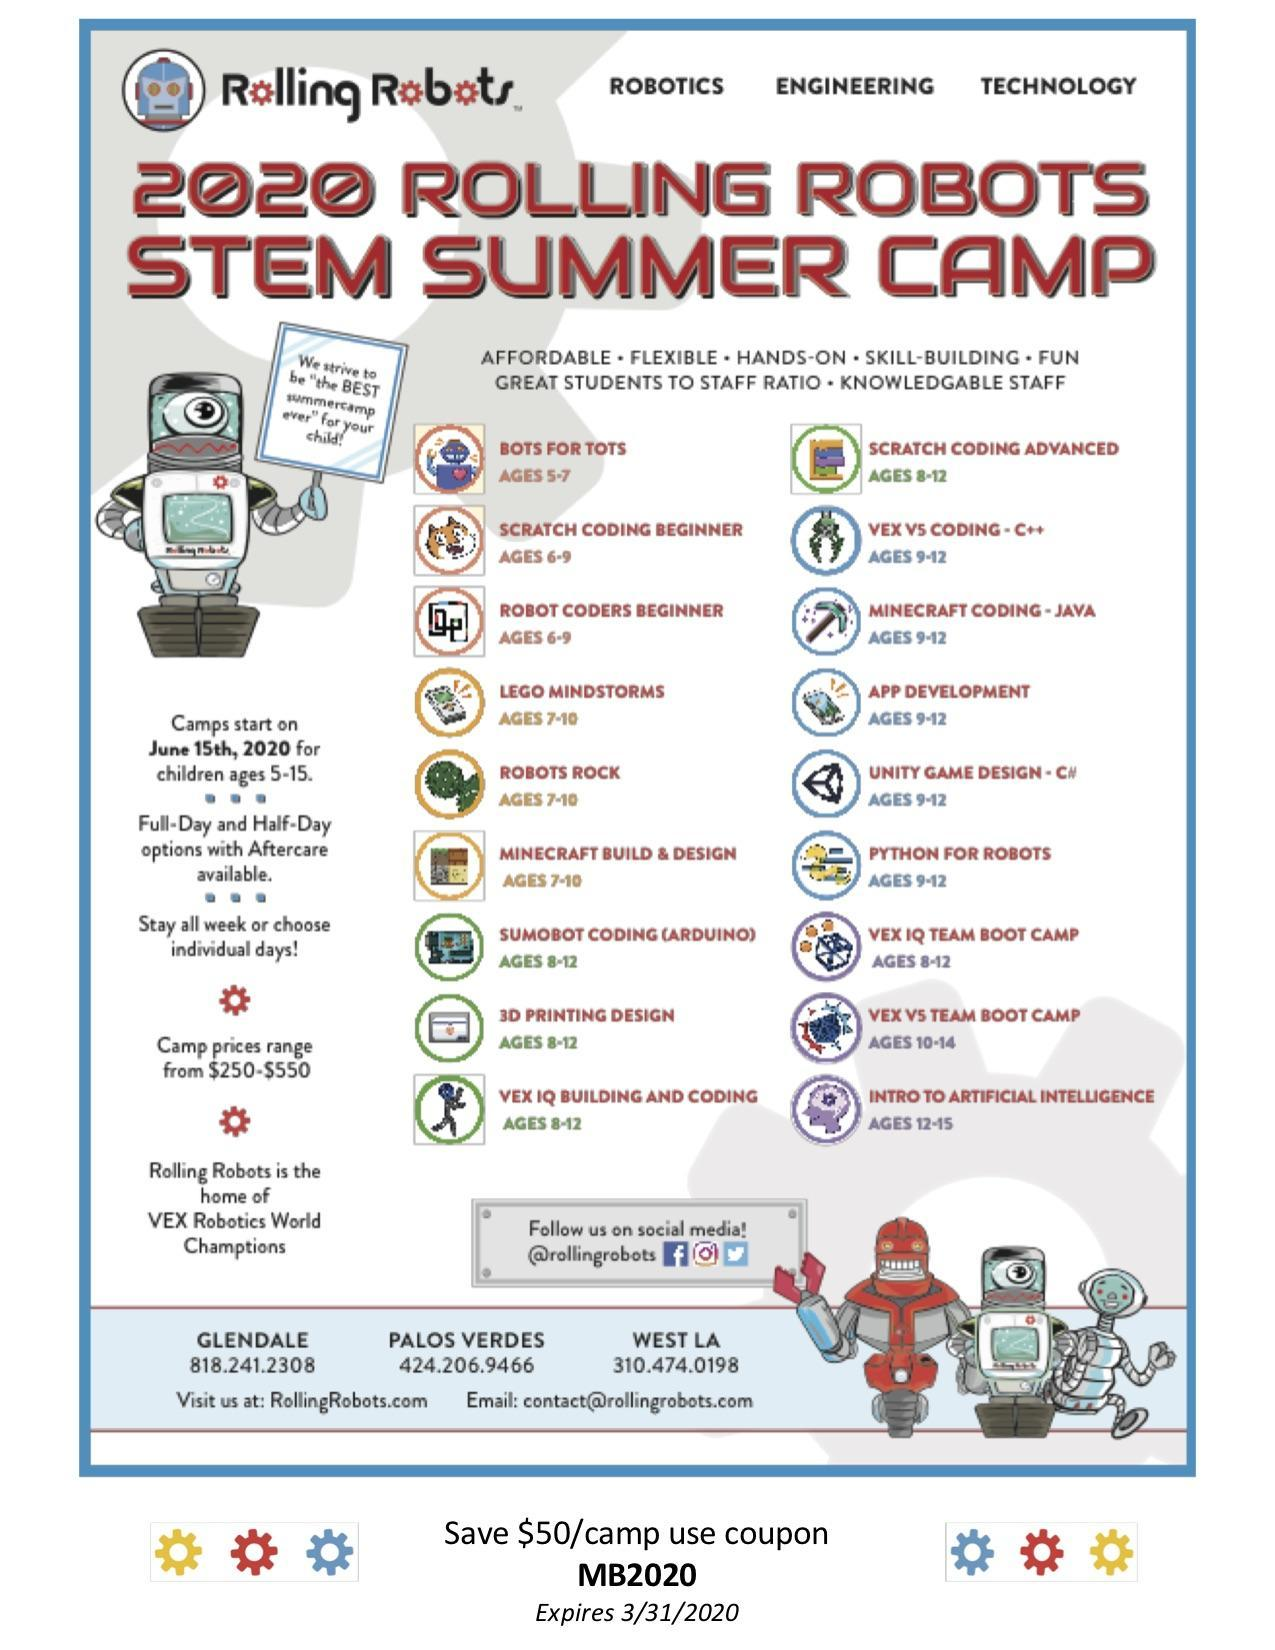 Rolling Robots Stem Camp